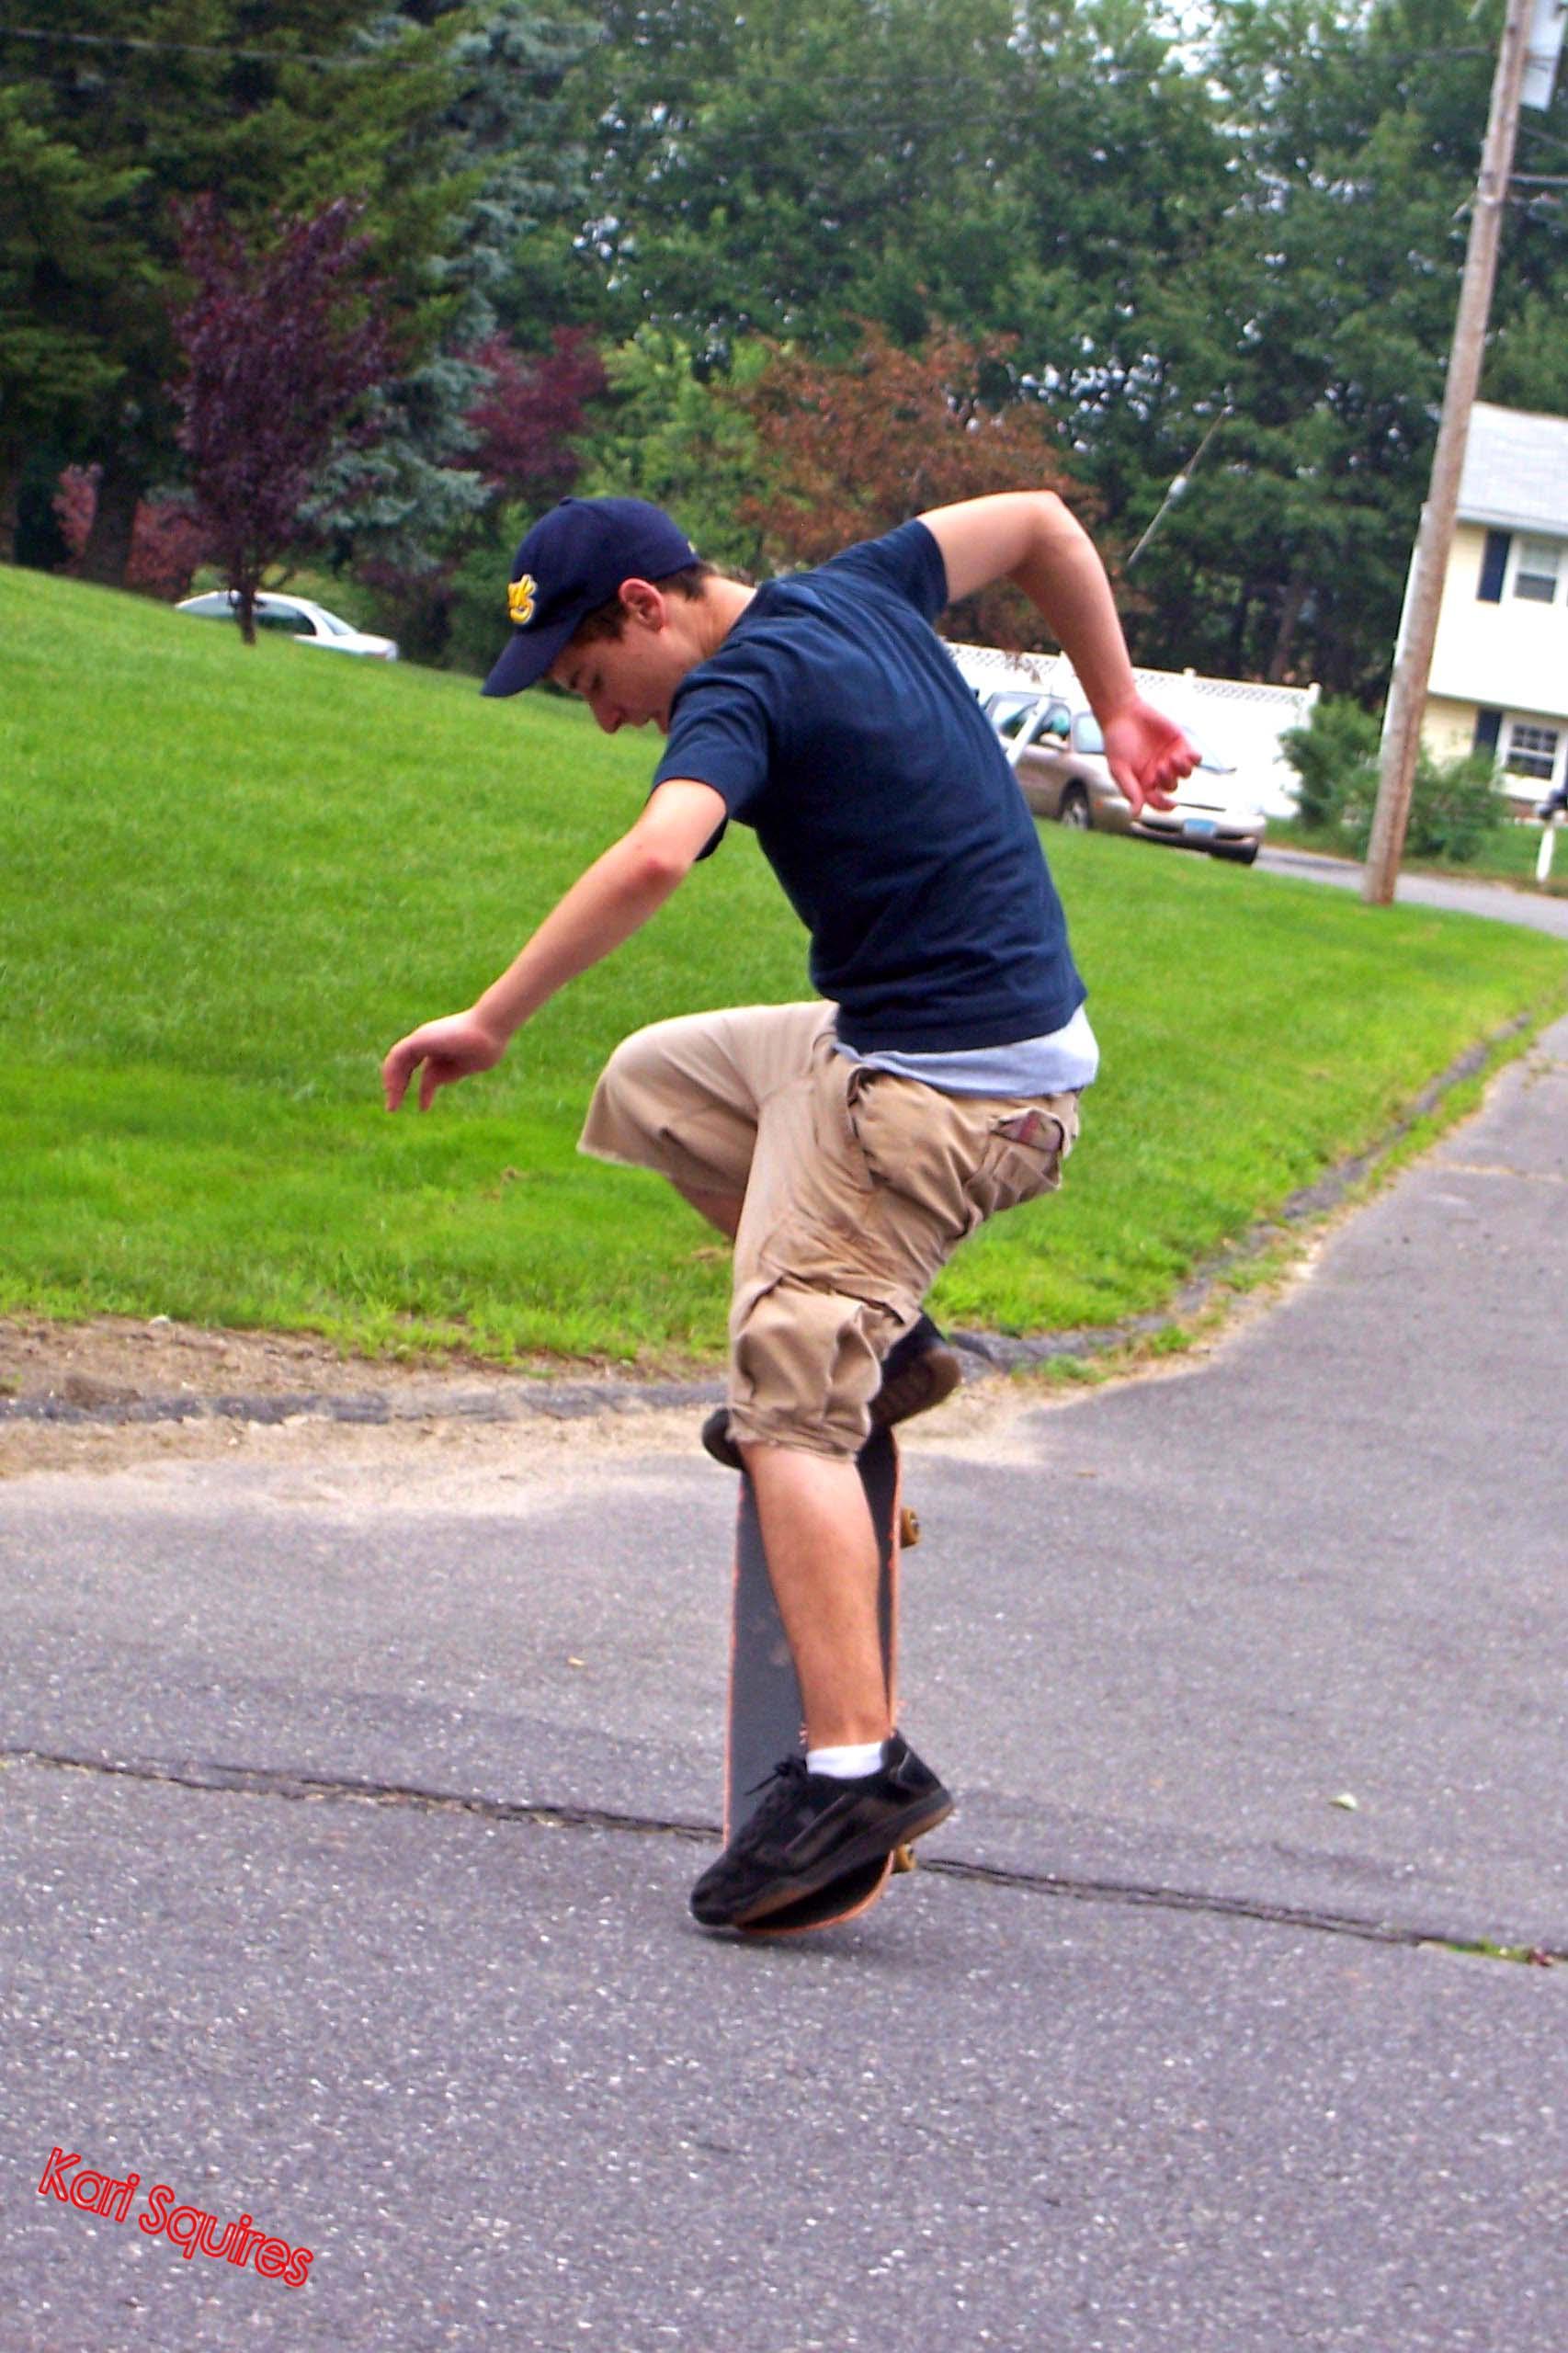 Ron Skateboarding 2 by PrimeTimePoetry